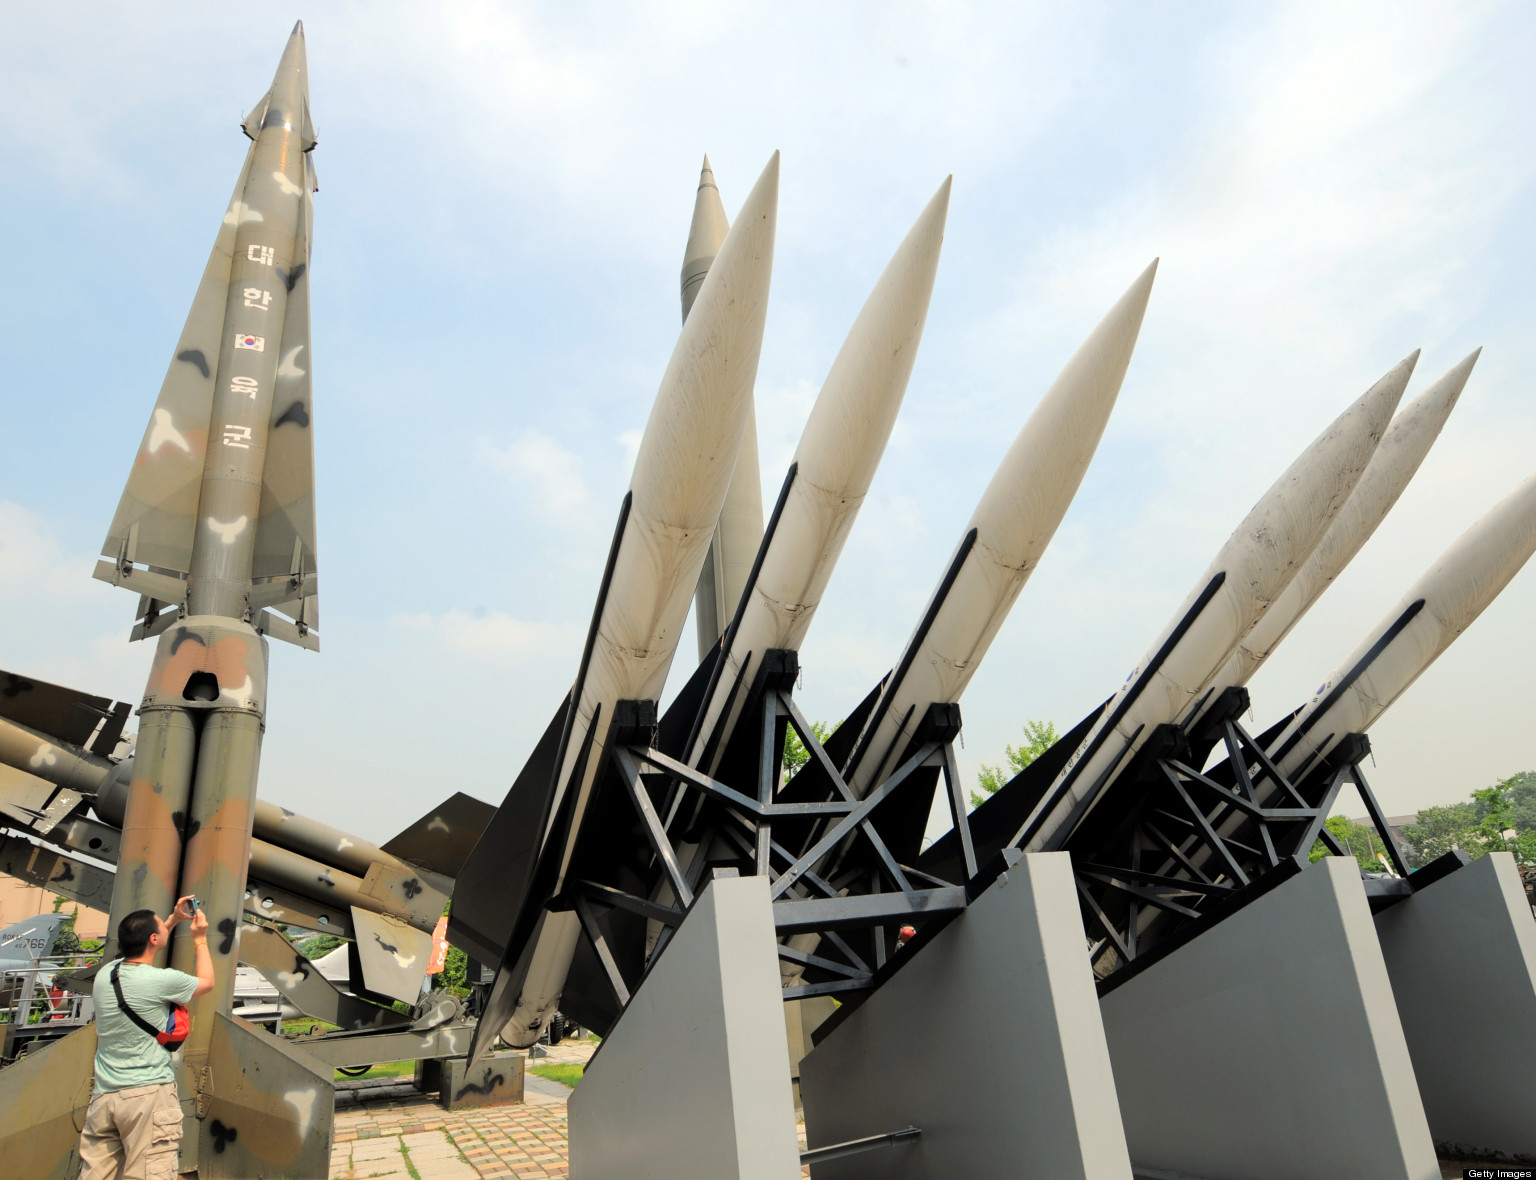 'Speculative' Pentagon Report Sparks NKorea Fears